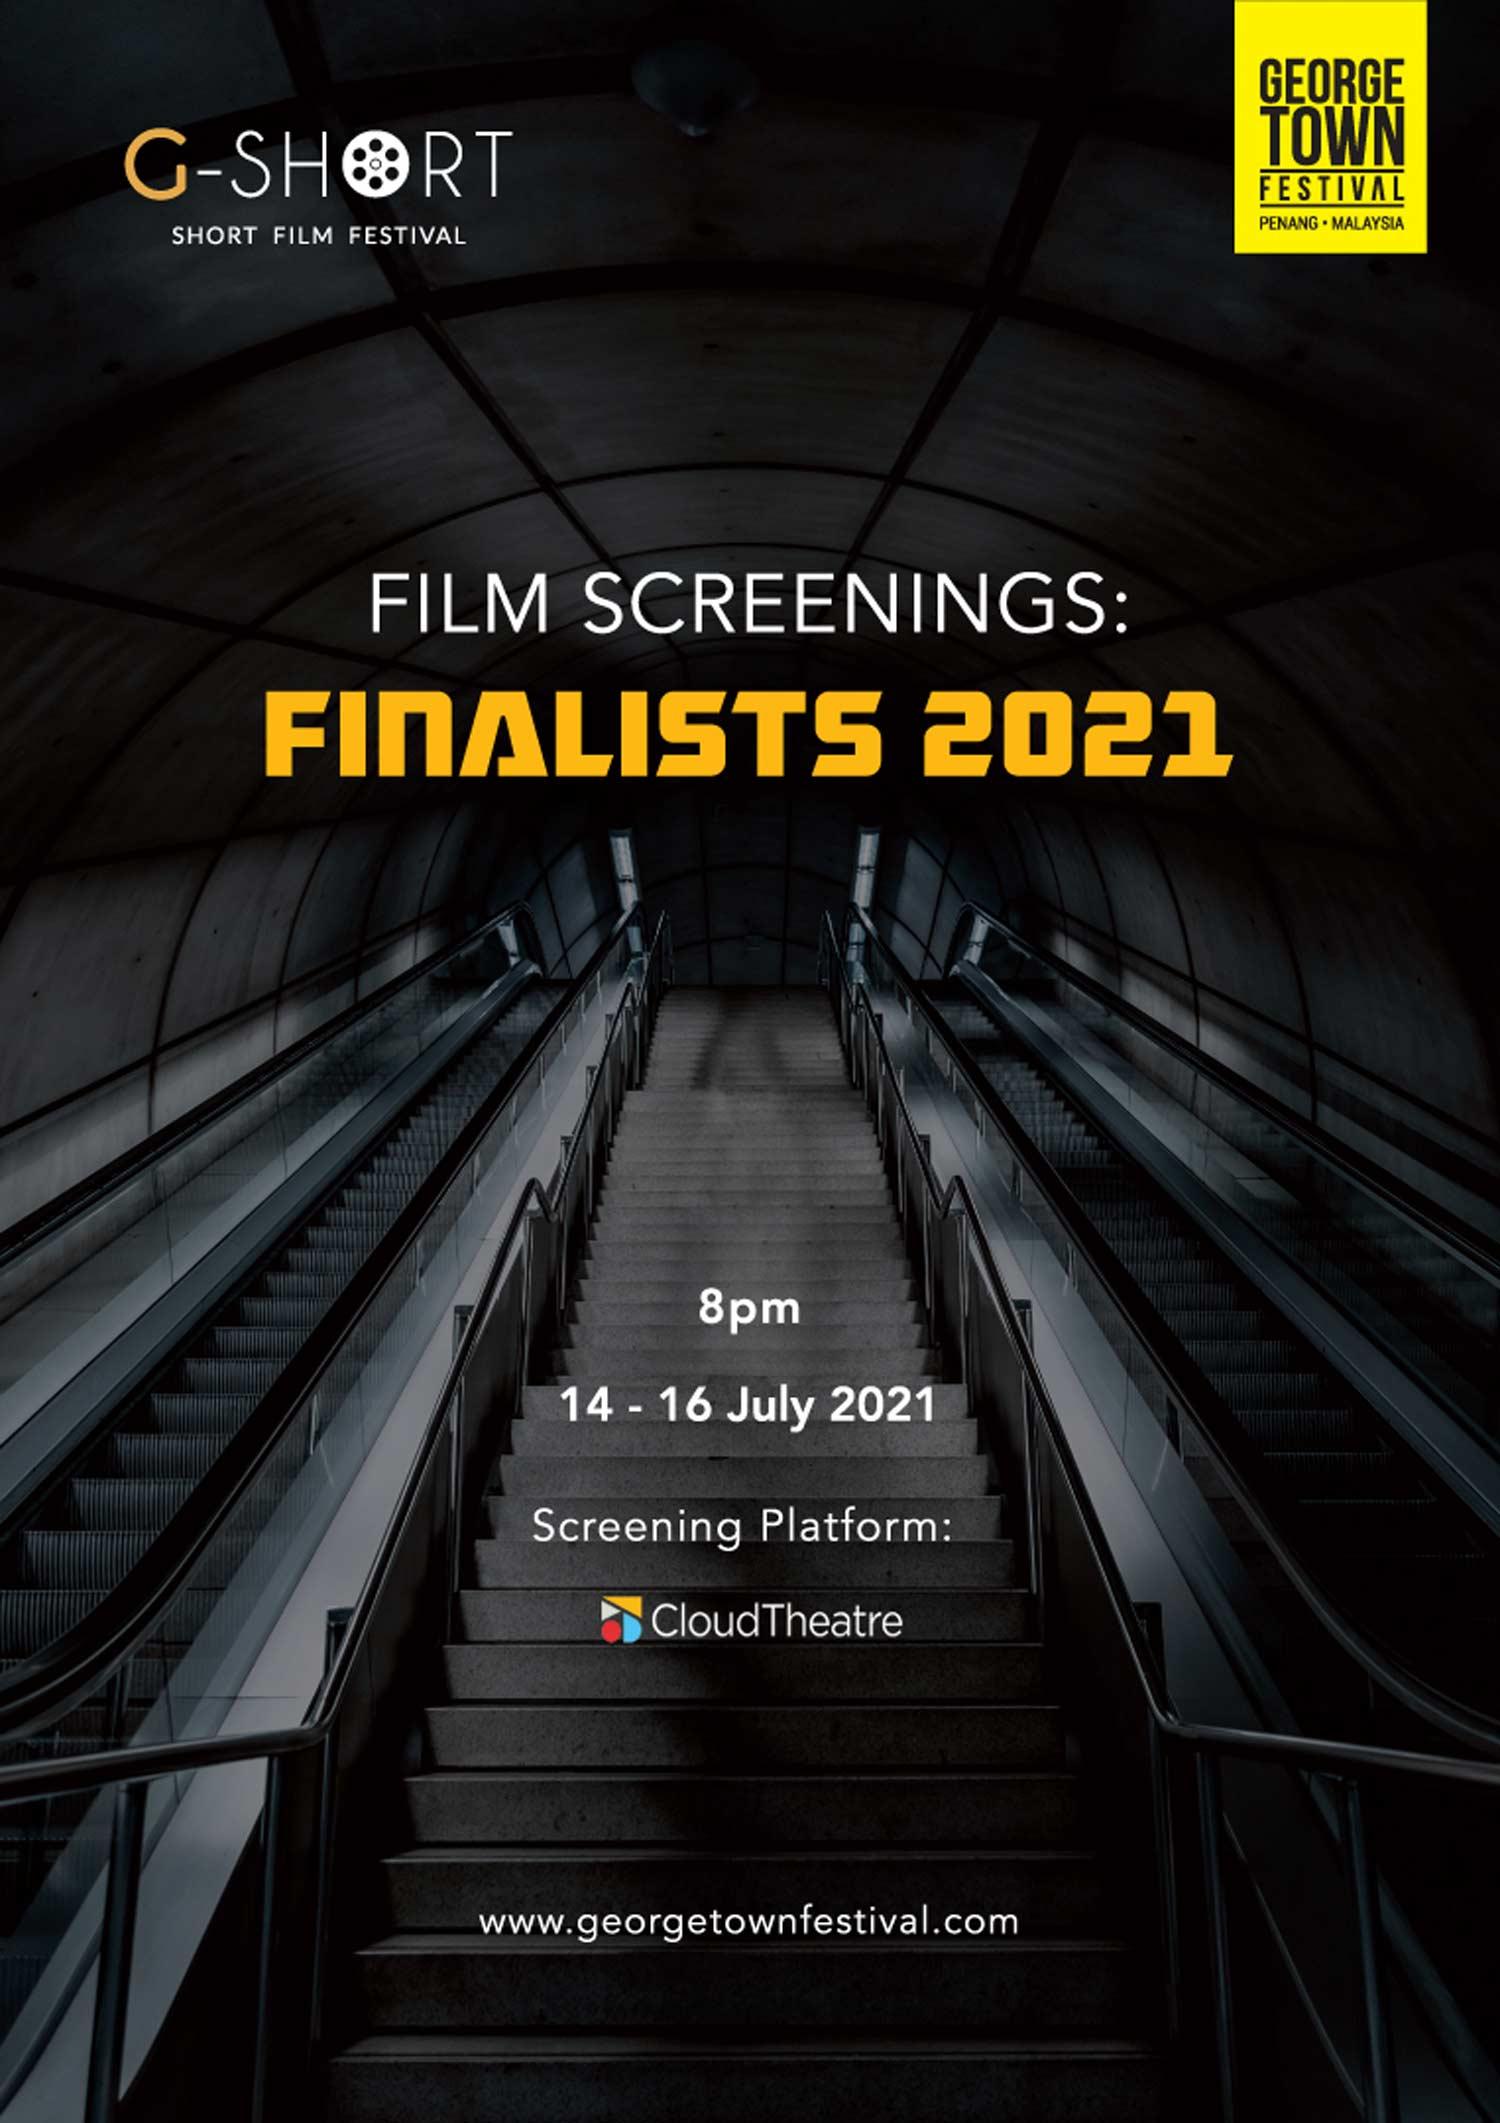 G-Short Film Screenings: Finalists 2021